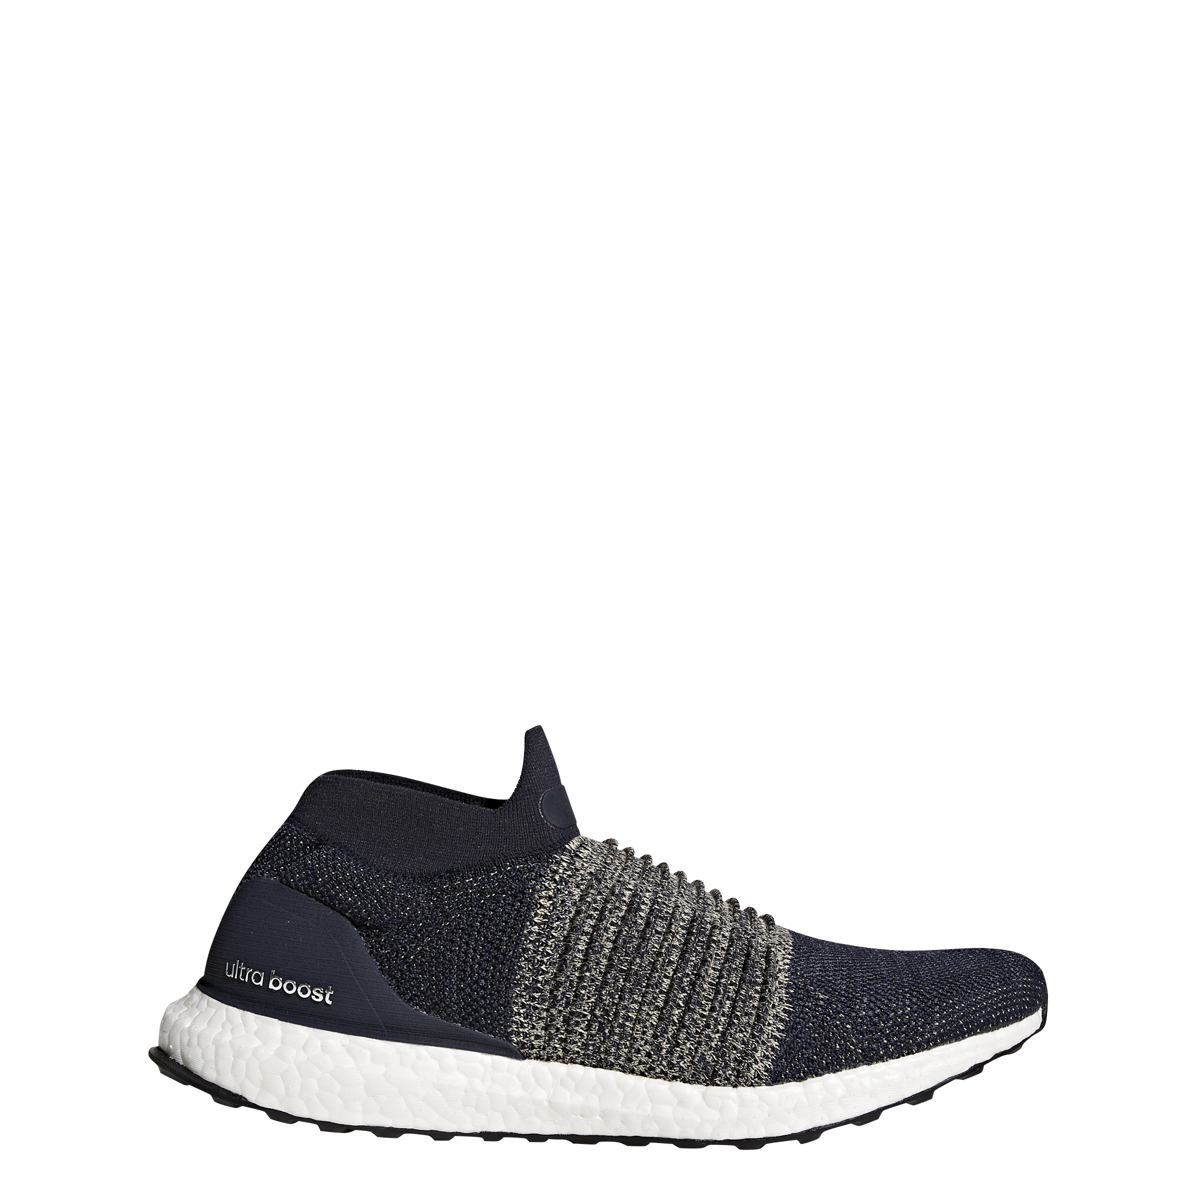 1c9b1c02af1 Men s Adidas UltraBOOST Laceless Running Shoe Blue Grey